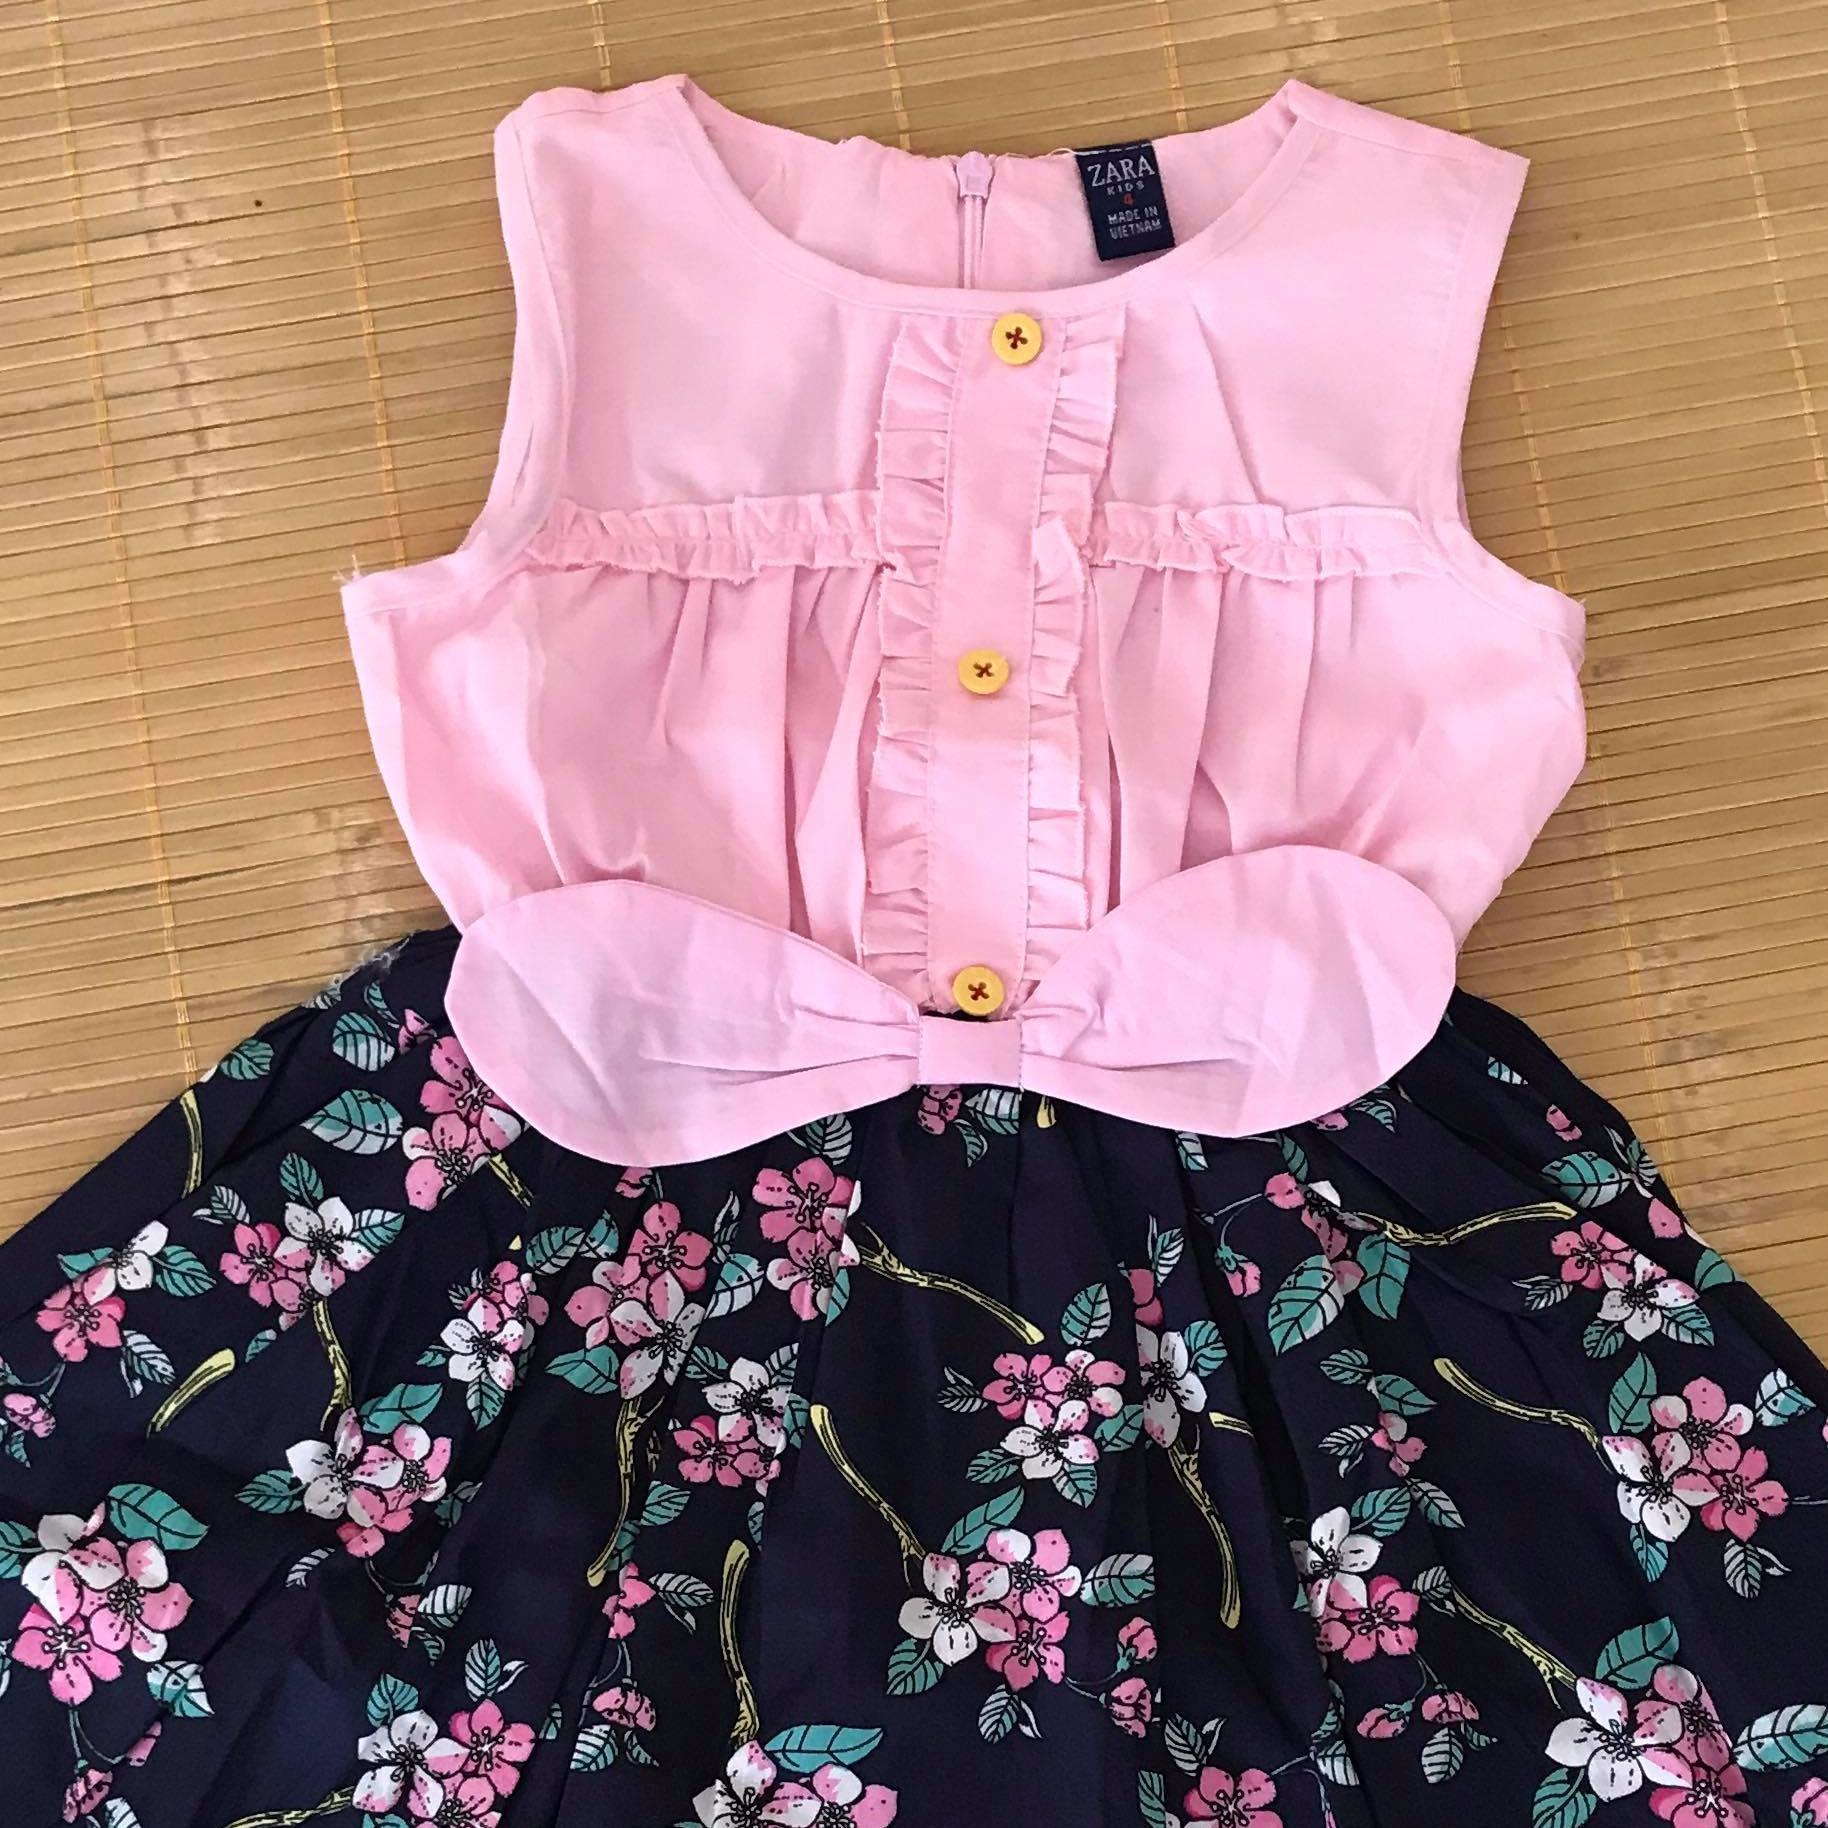 Đầm tai thỏ Zara Kid chân váy hoa